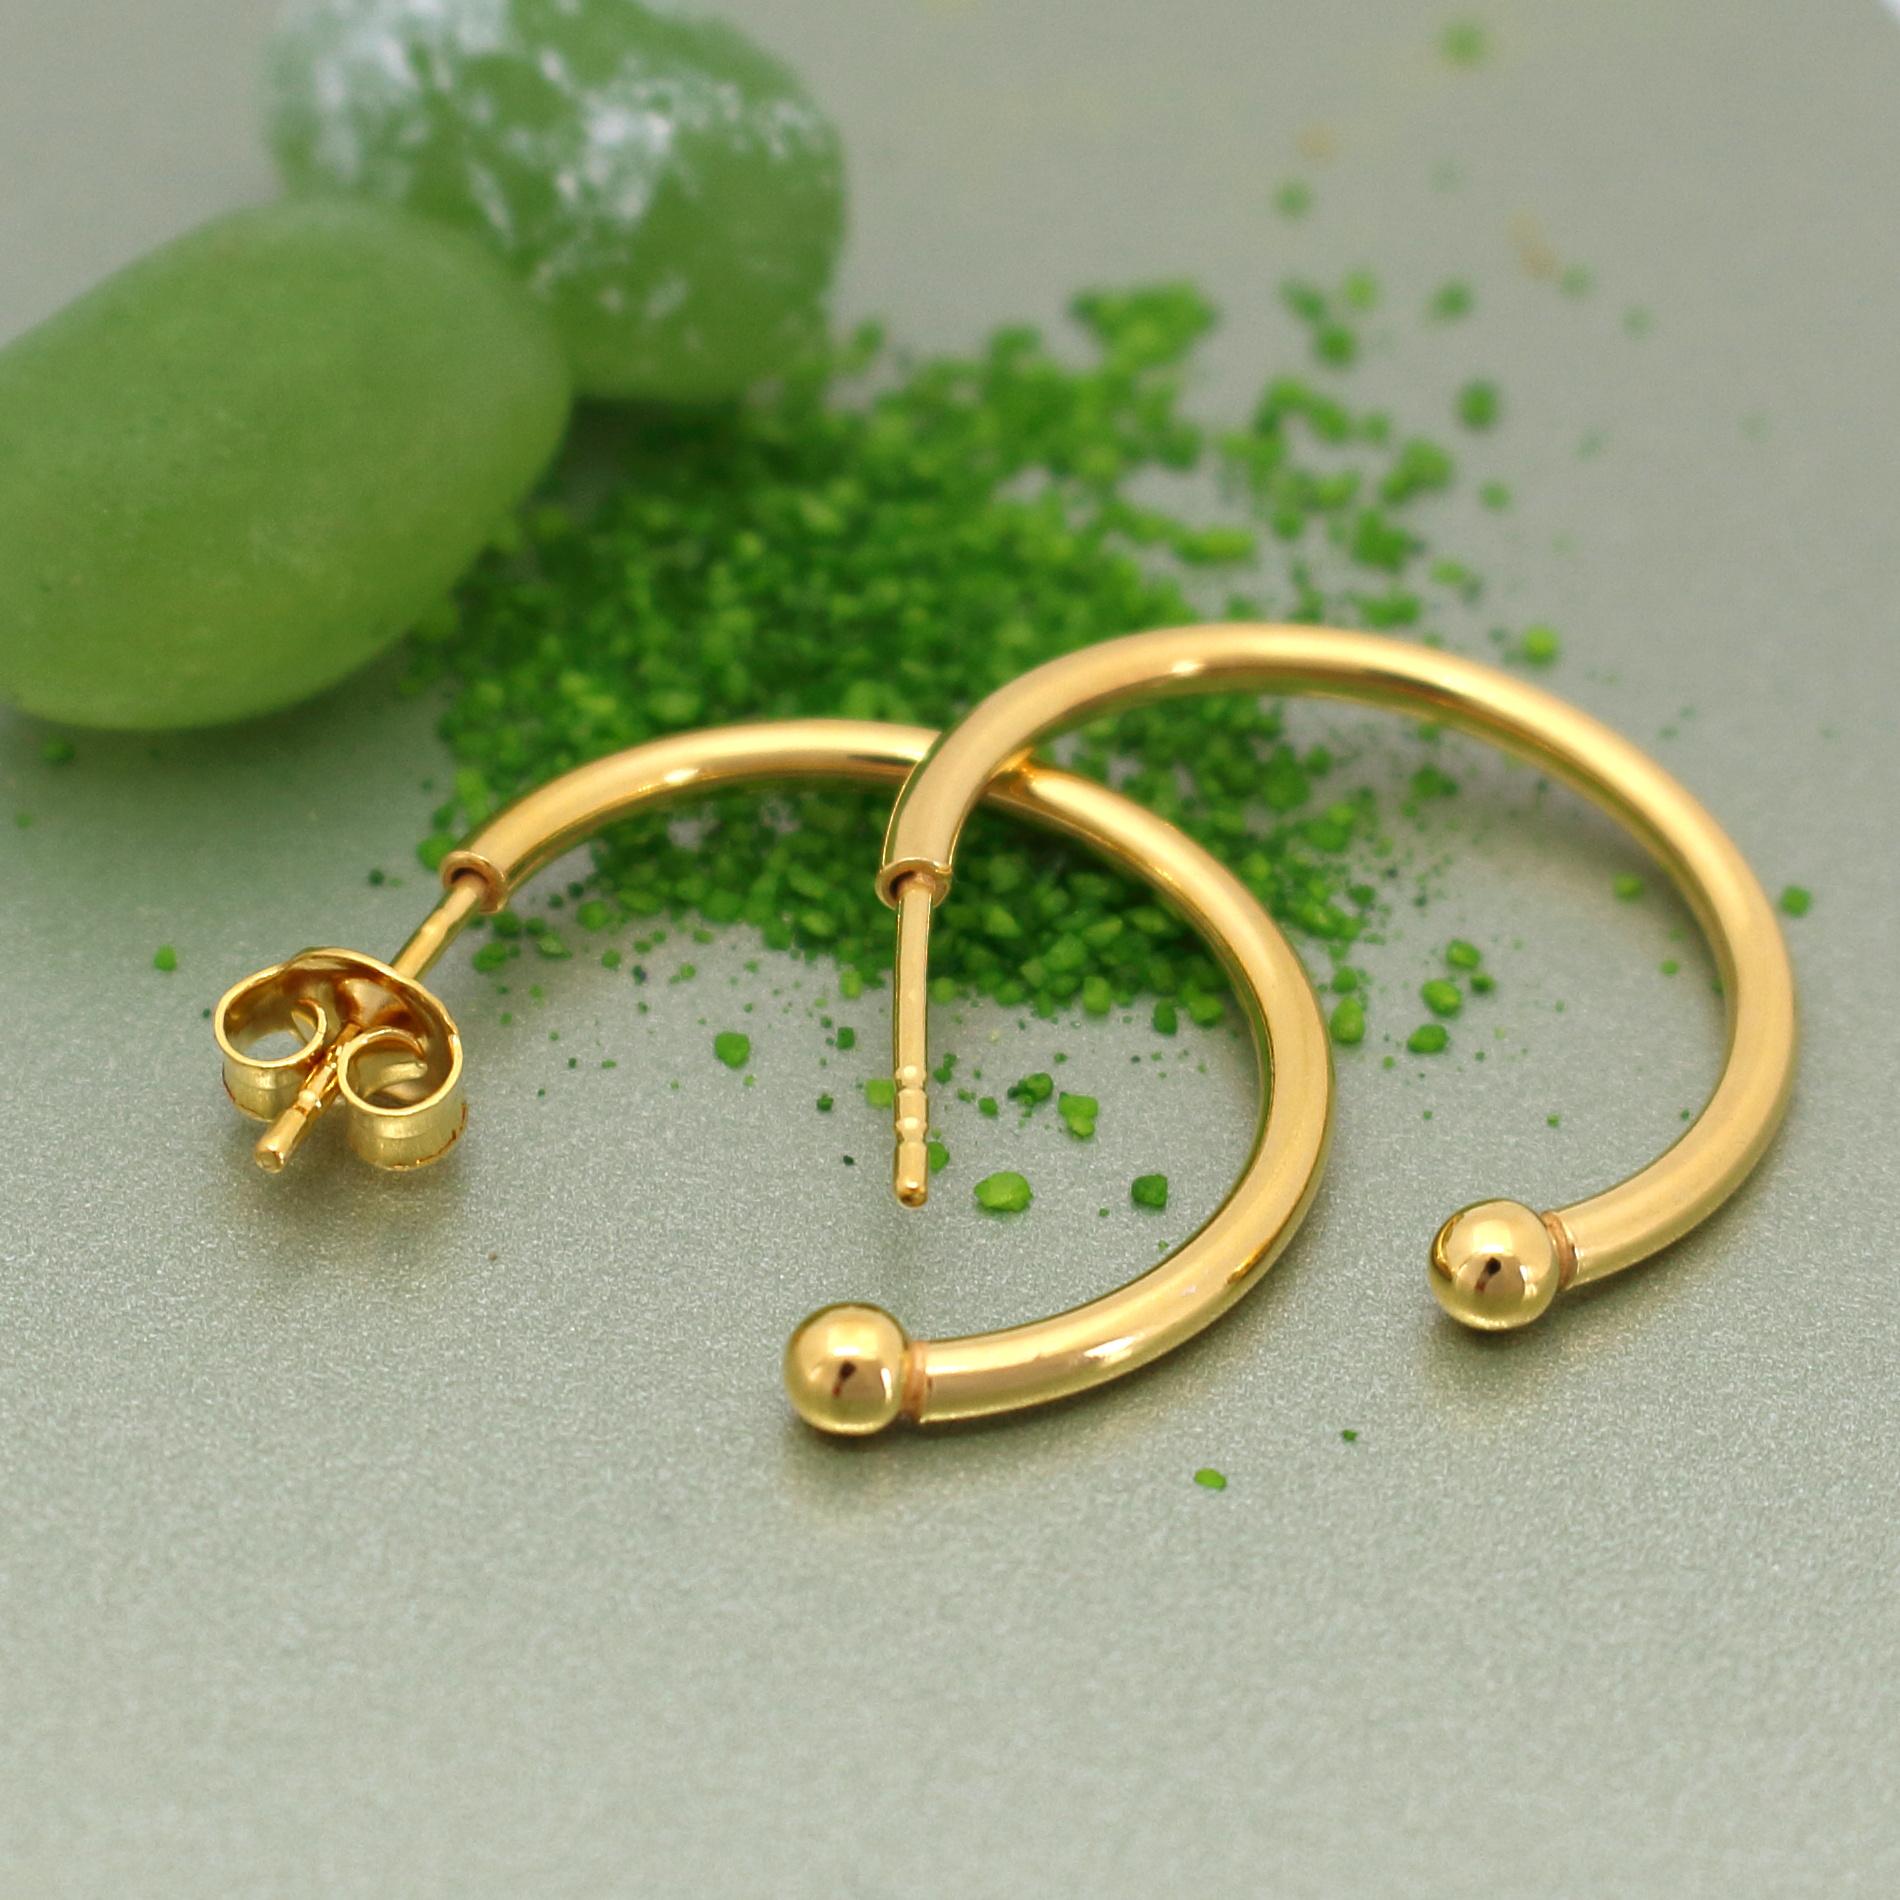 Ohrringe Creolen Sterling Silber vergoldet